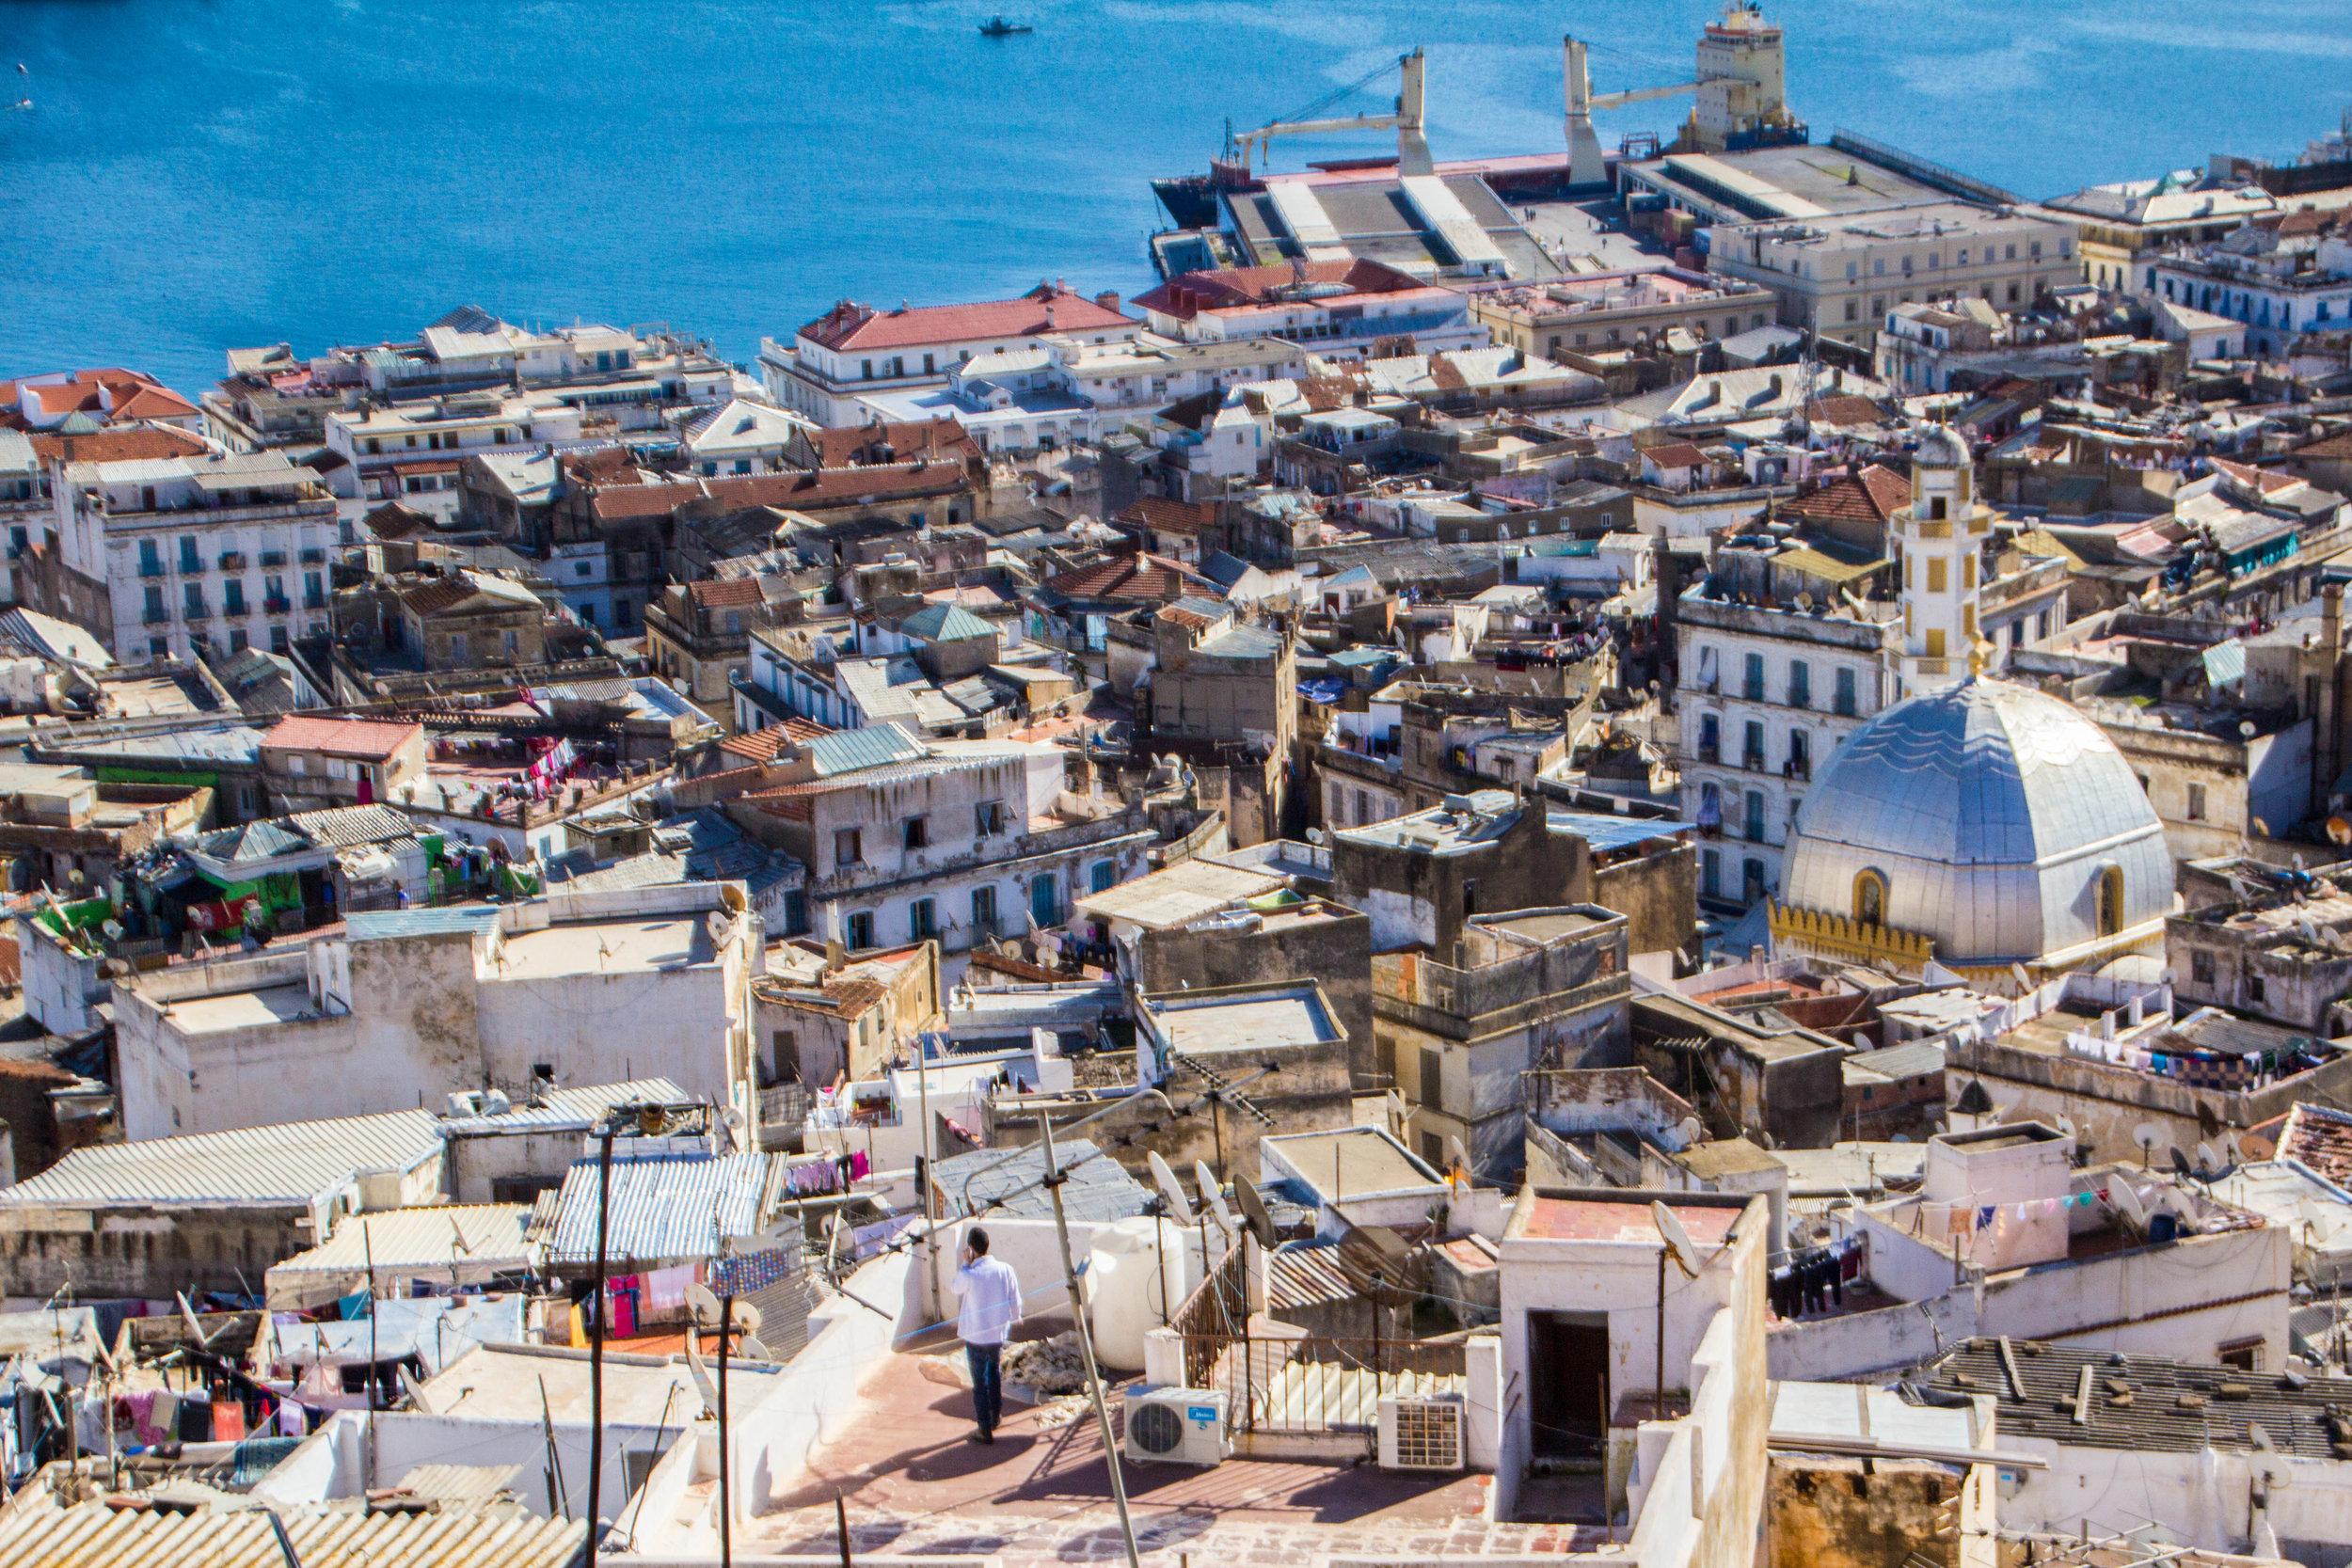 casbah-from-above-algiers-algeria-34.jpg